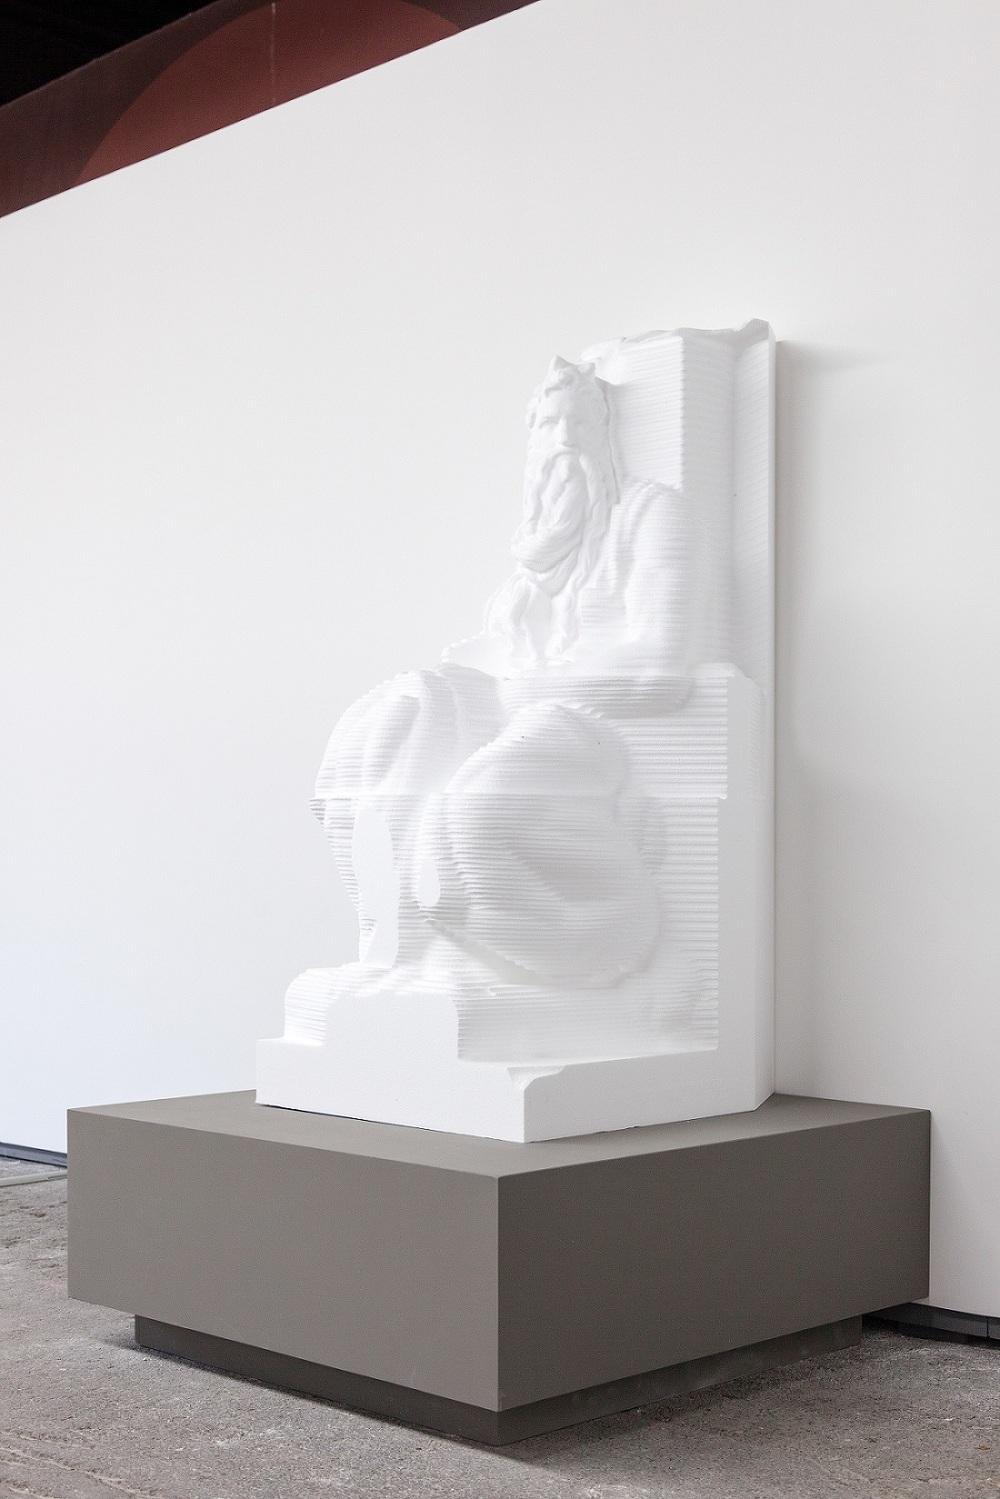 The Cool Couple, A Kind of Display, Prophet, 2015, fresatura da modello 3D, polistirolo, cm 170x90x70 © The Cool Couple, courtesy Metronom/Viasaterna